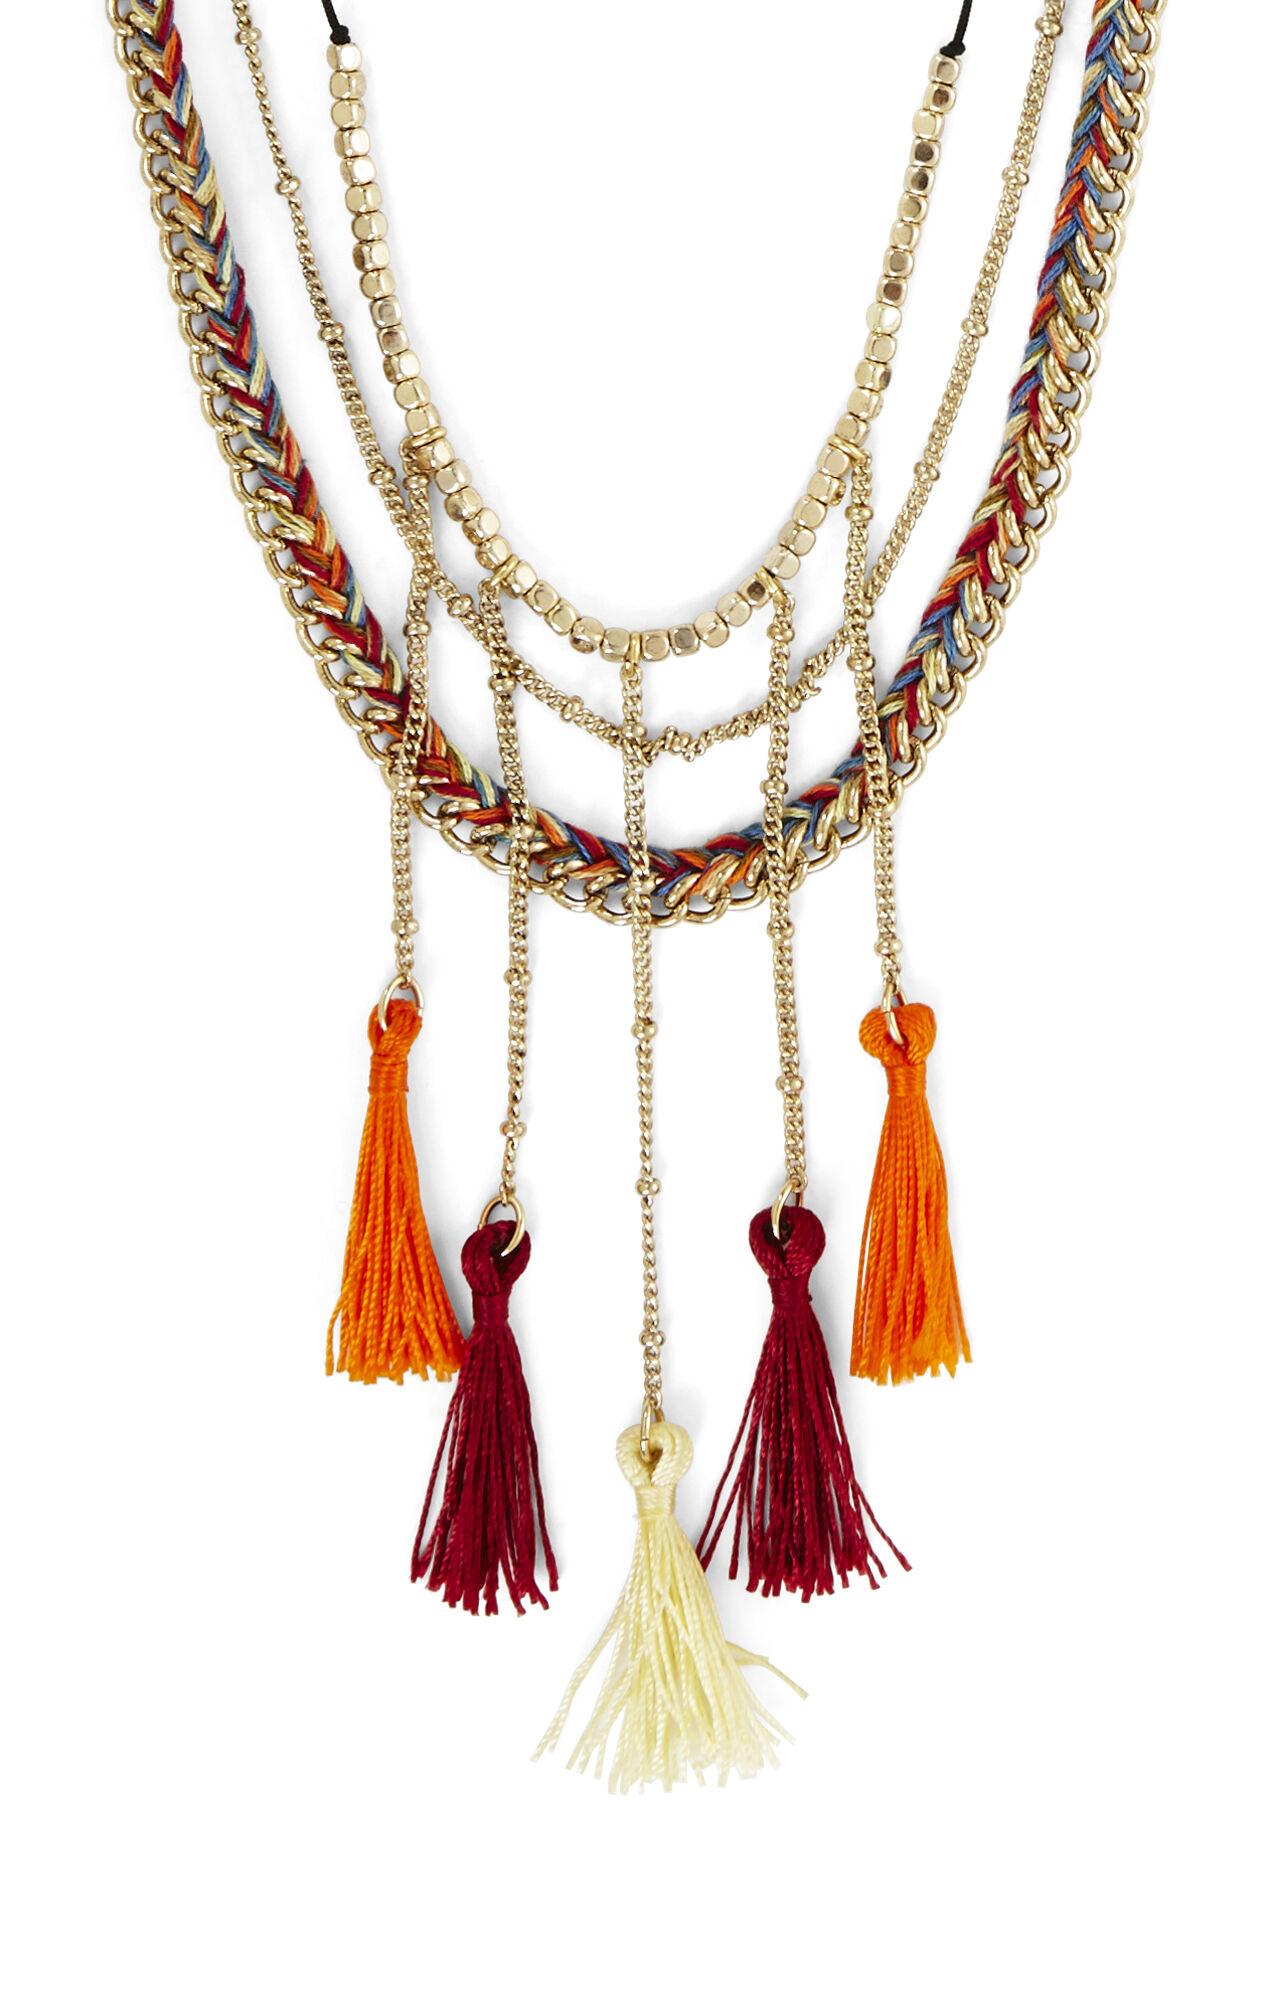 Boho Braided Tassel Necklace